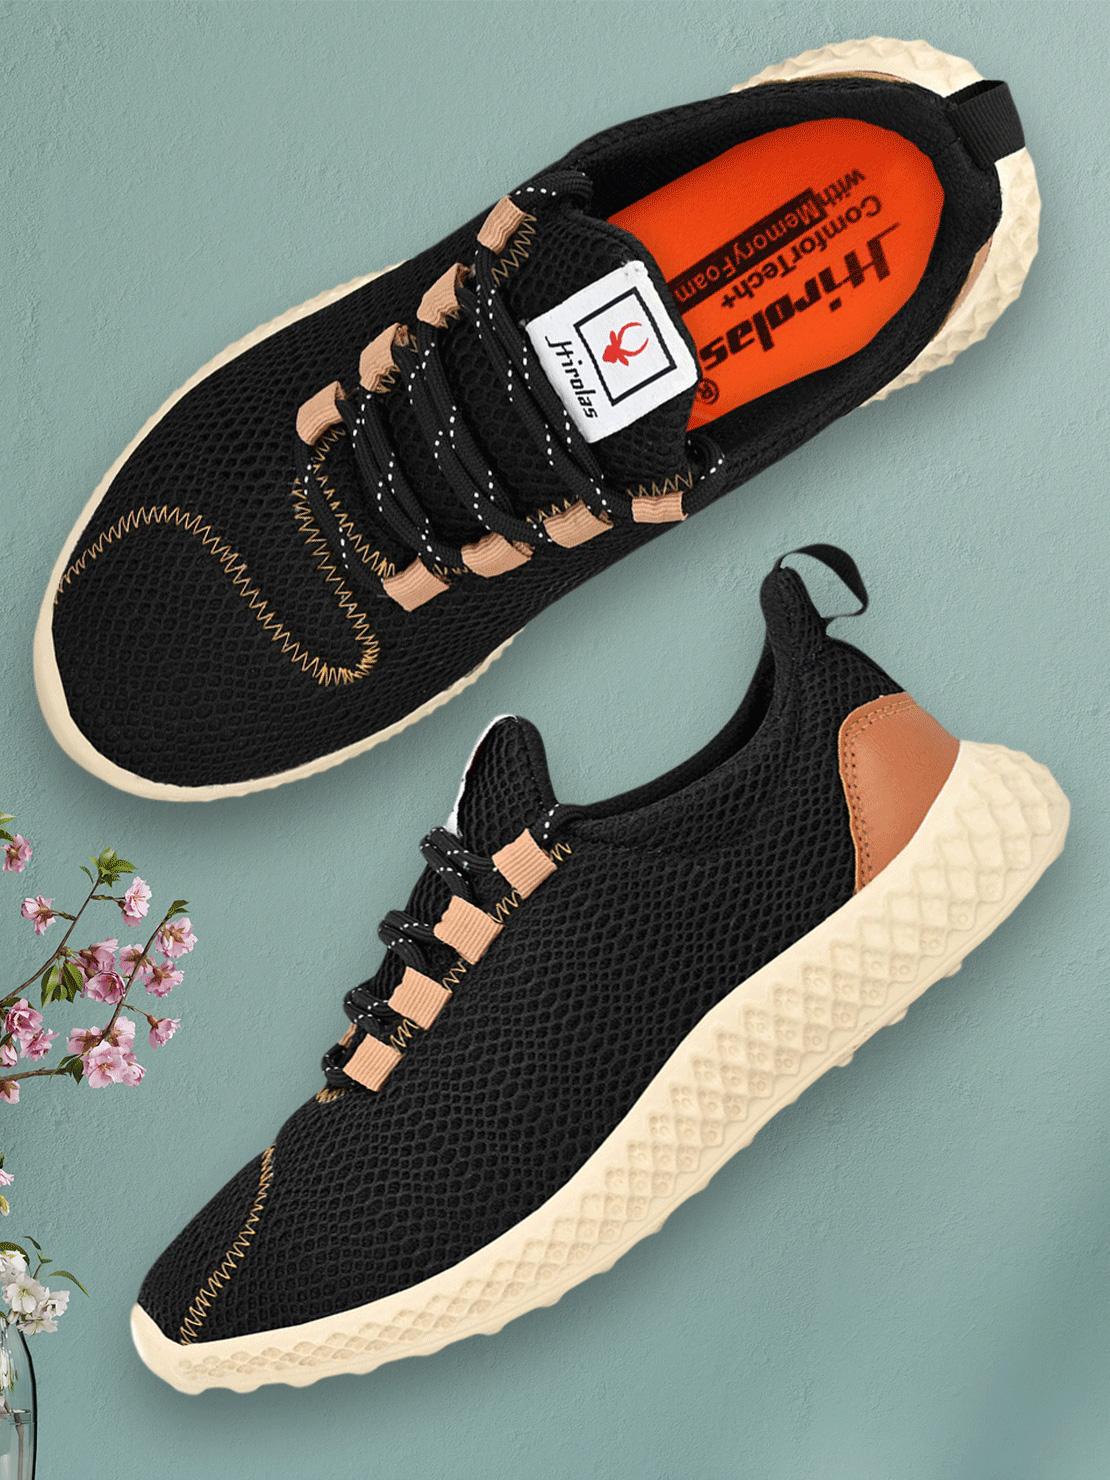 Hirolas | Hirolas® Men's Mesh Black Running/Walking/Gym/Jogging Sports Sneaker Shoes